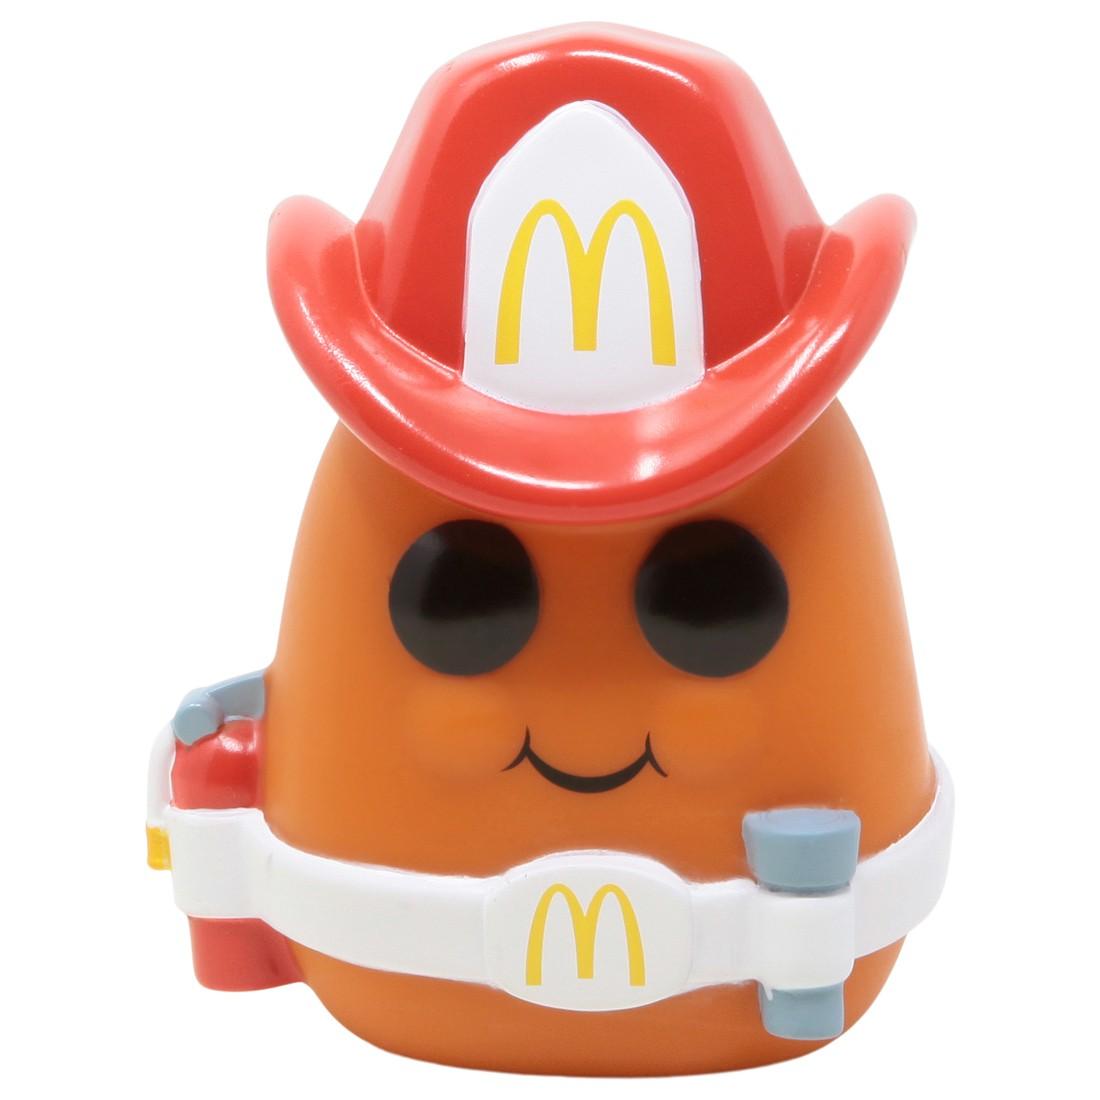 Funko POP Ad Icons McDonald's - Fireman McNugget (red)